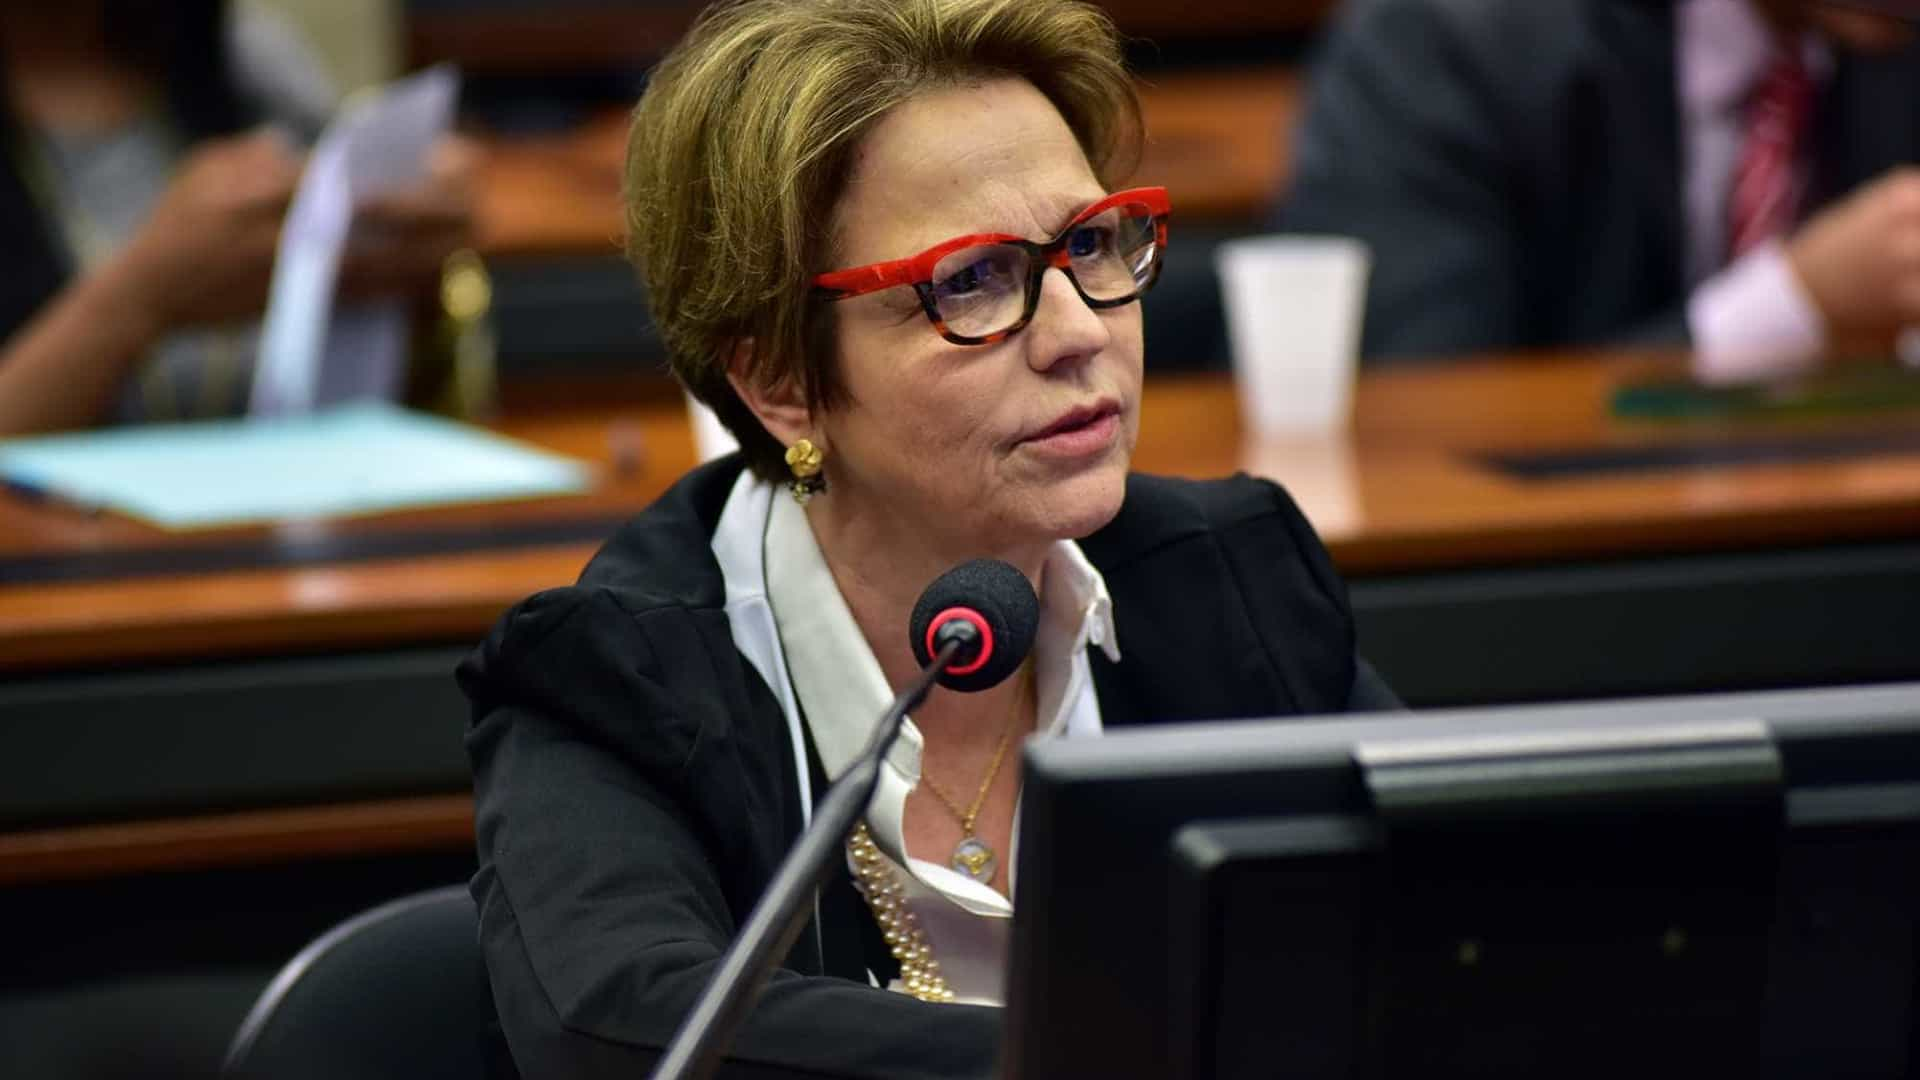 Ministra questiona resultado de estudos sobre agrotóxicos